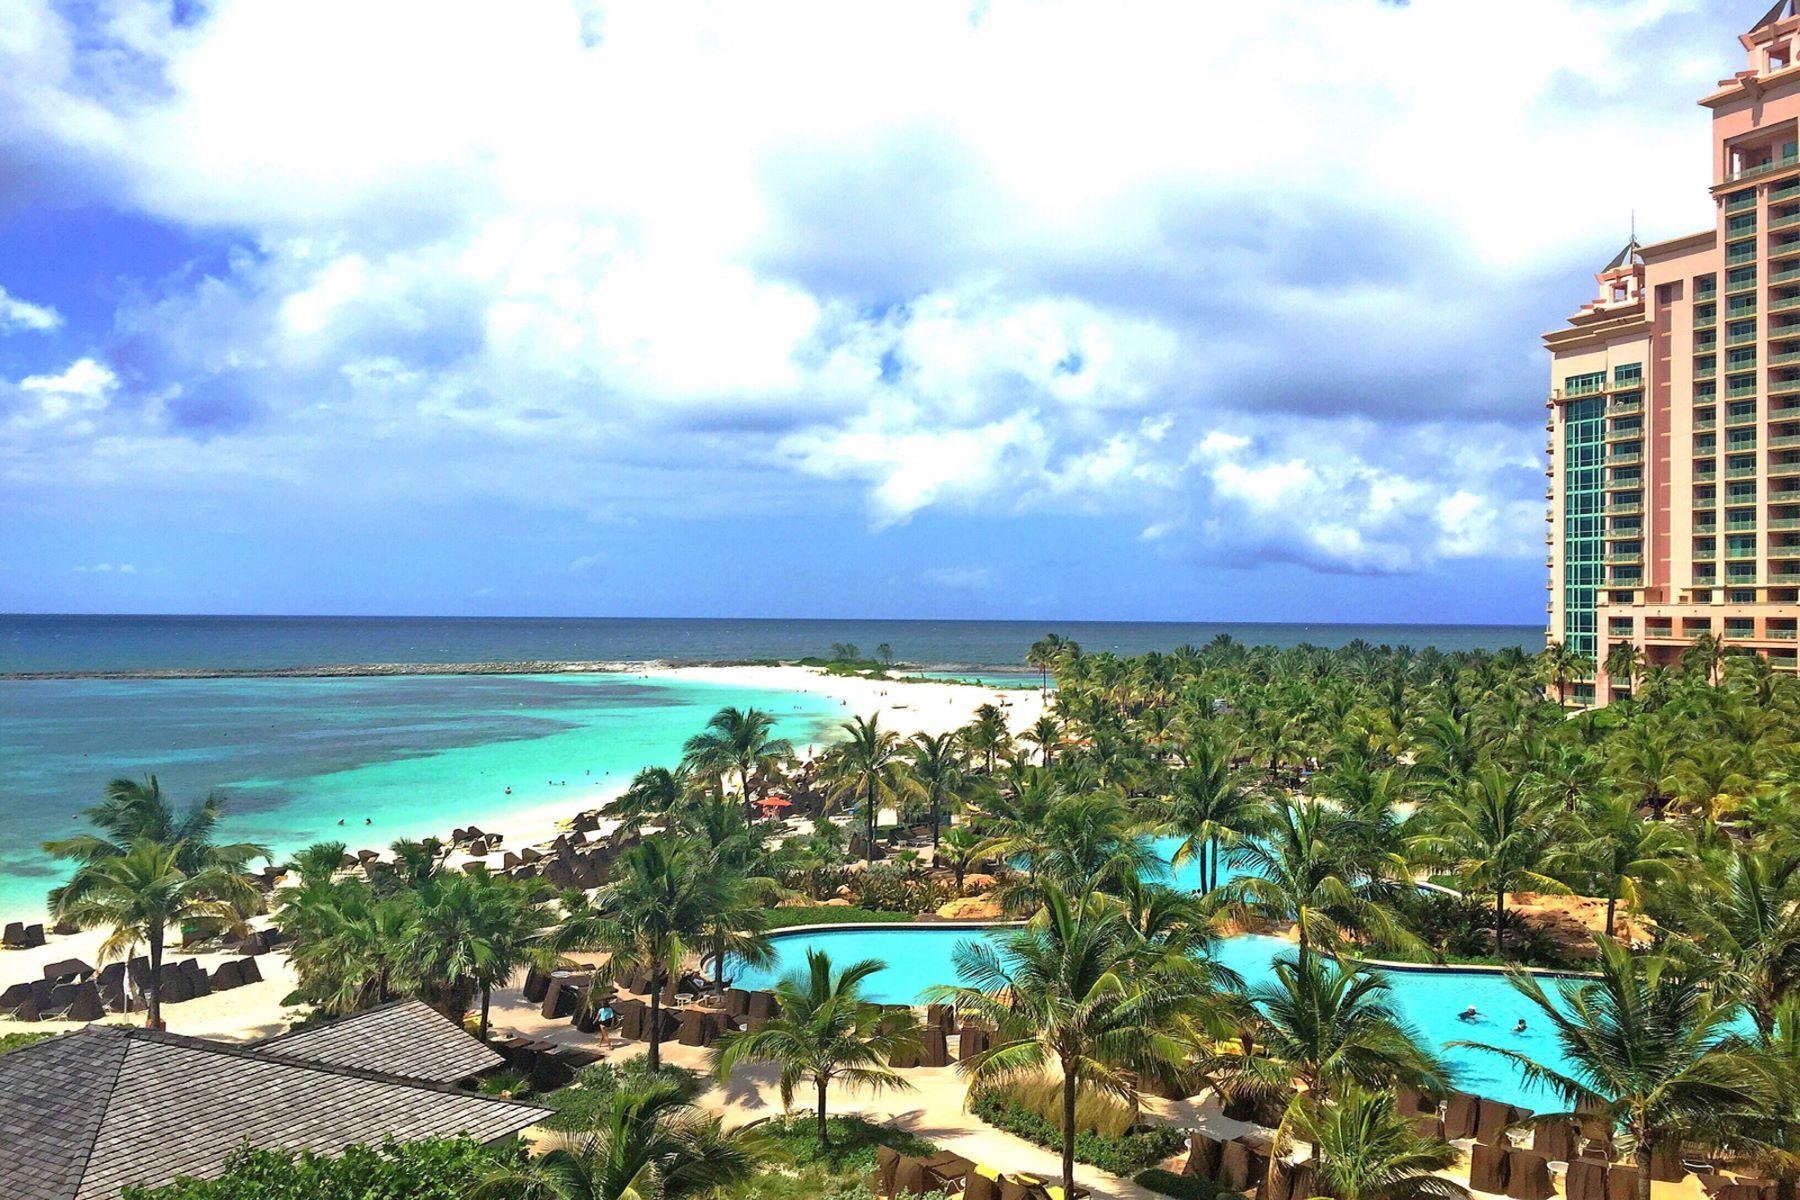 Condominium for Sale at The Reef 20-924/922 at Atlantis The Reef At Atlantis, Paradise Island, Nassau And Paradise Island Bahamas